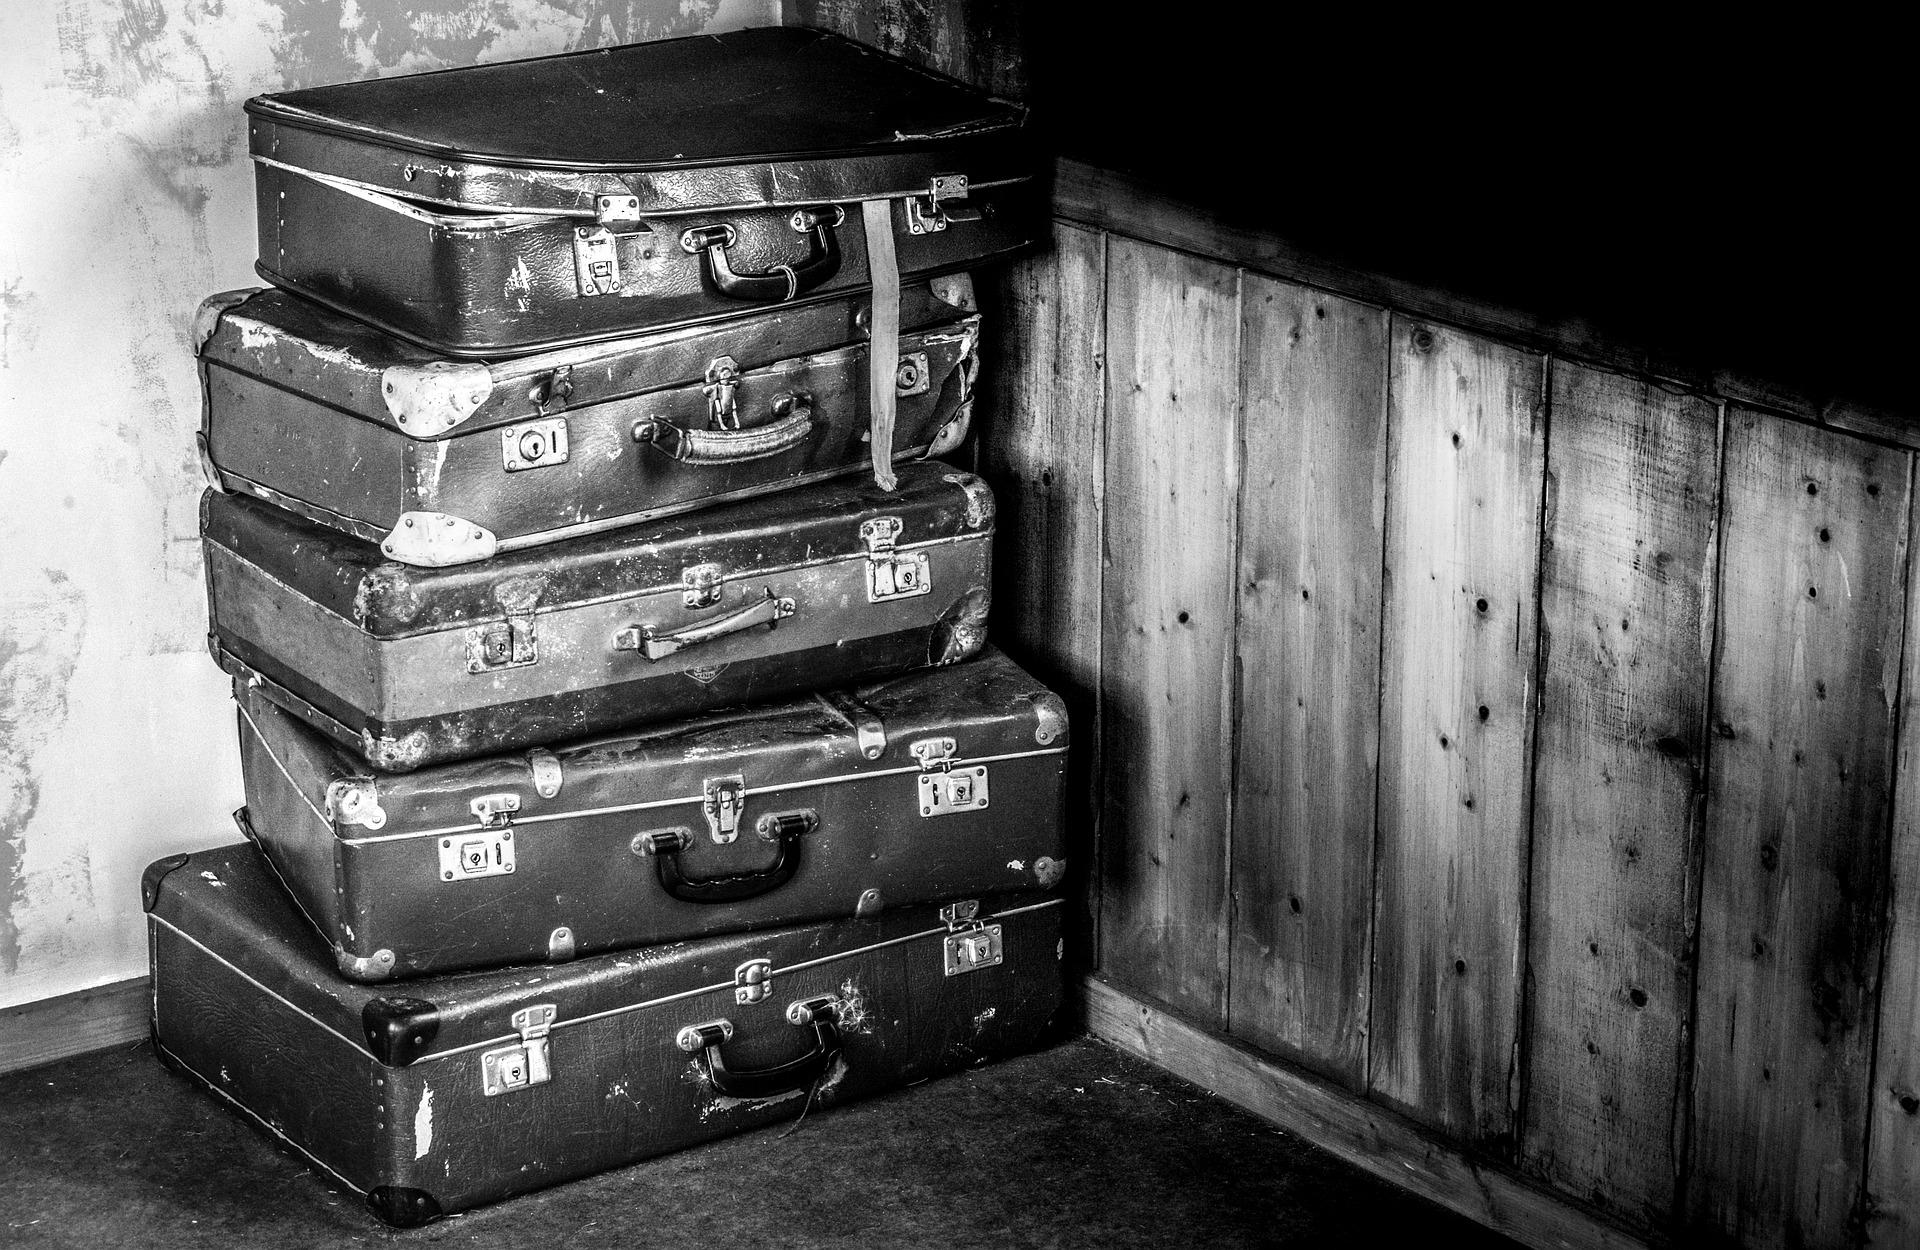 suitcases-2525193_1920.jpg